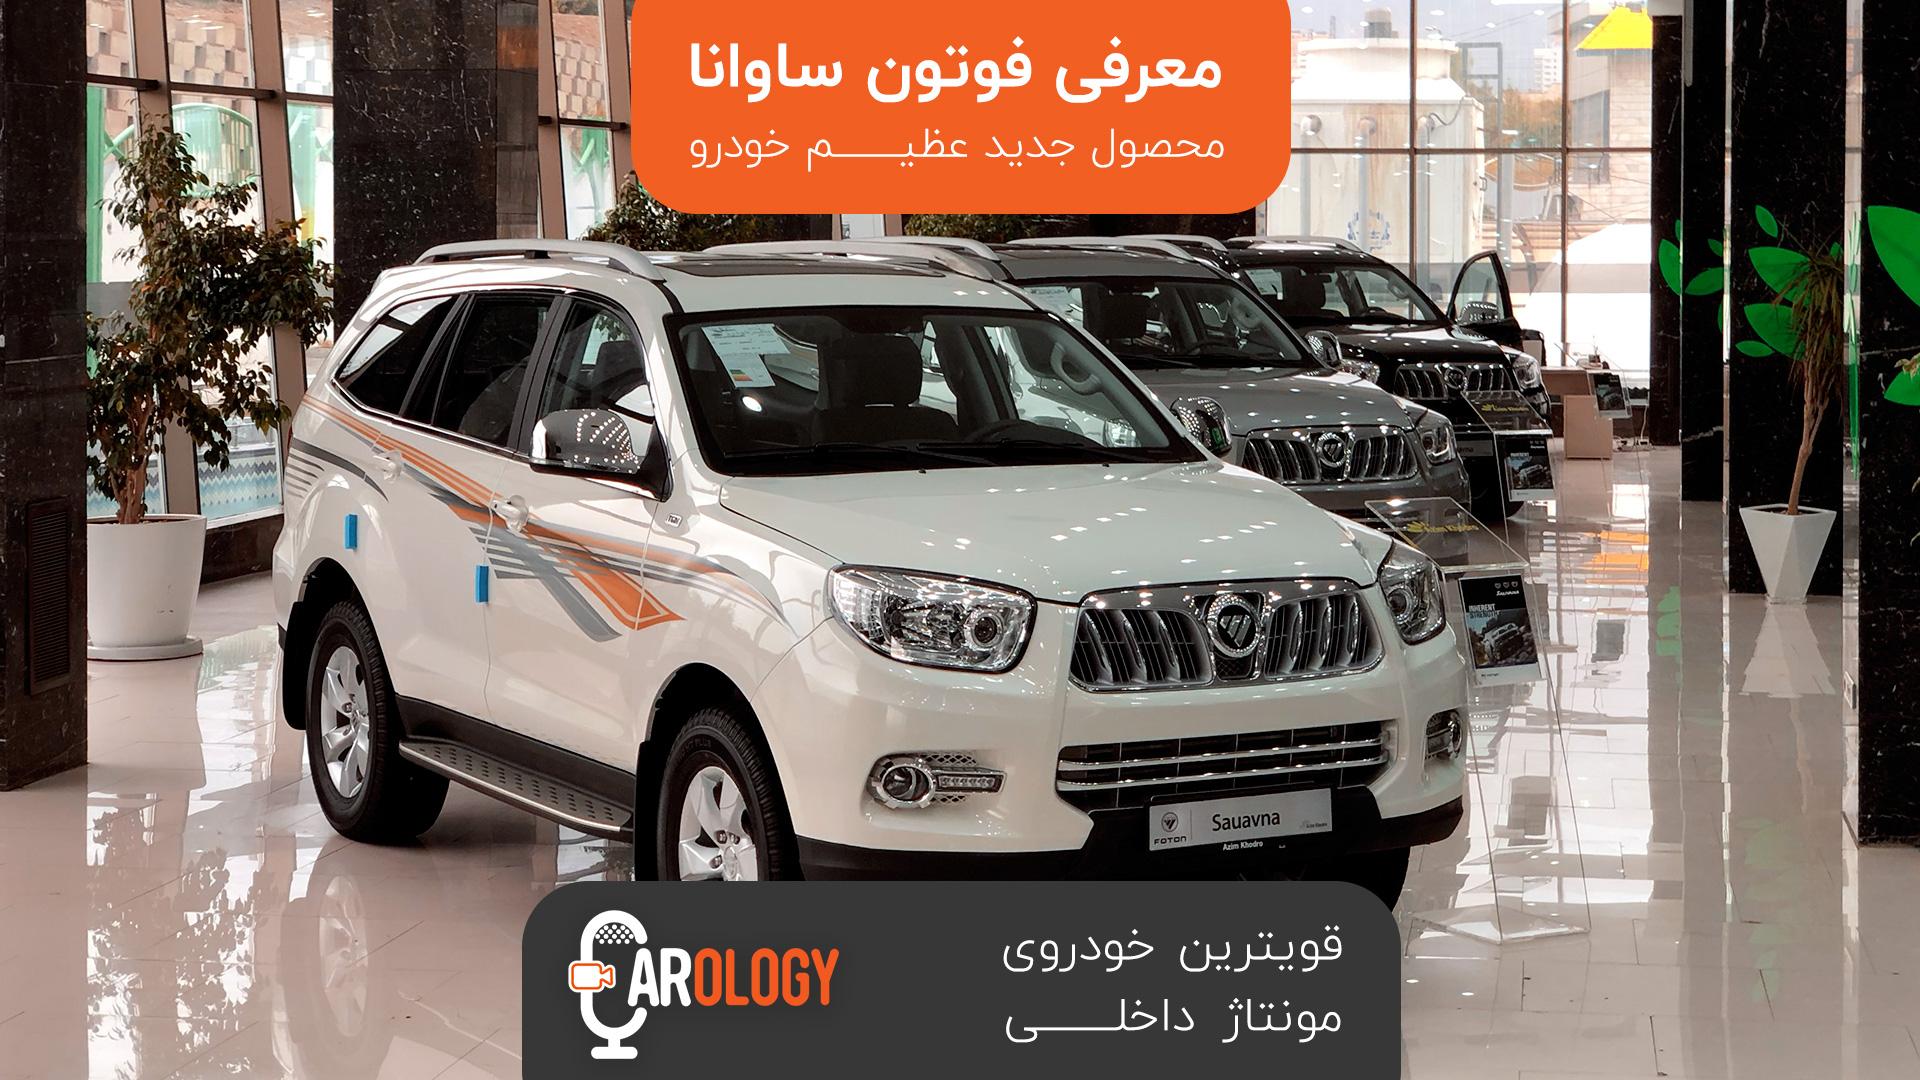 کارولوژی (8): معرفی فوتون ساوانا، محصول جدید عظیم خودرو